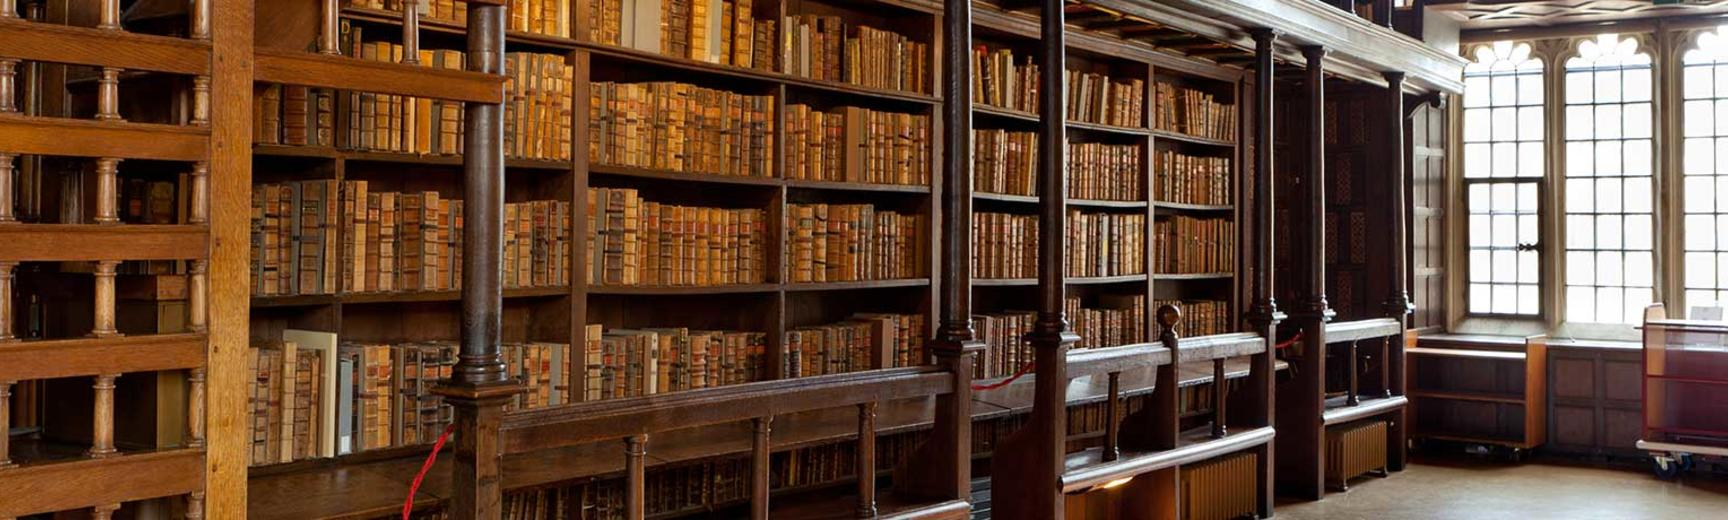 Duke Humfrey's Library, Bodleian